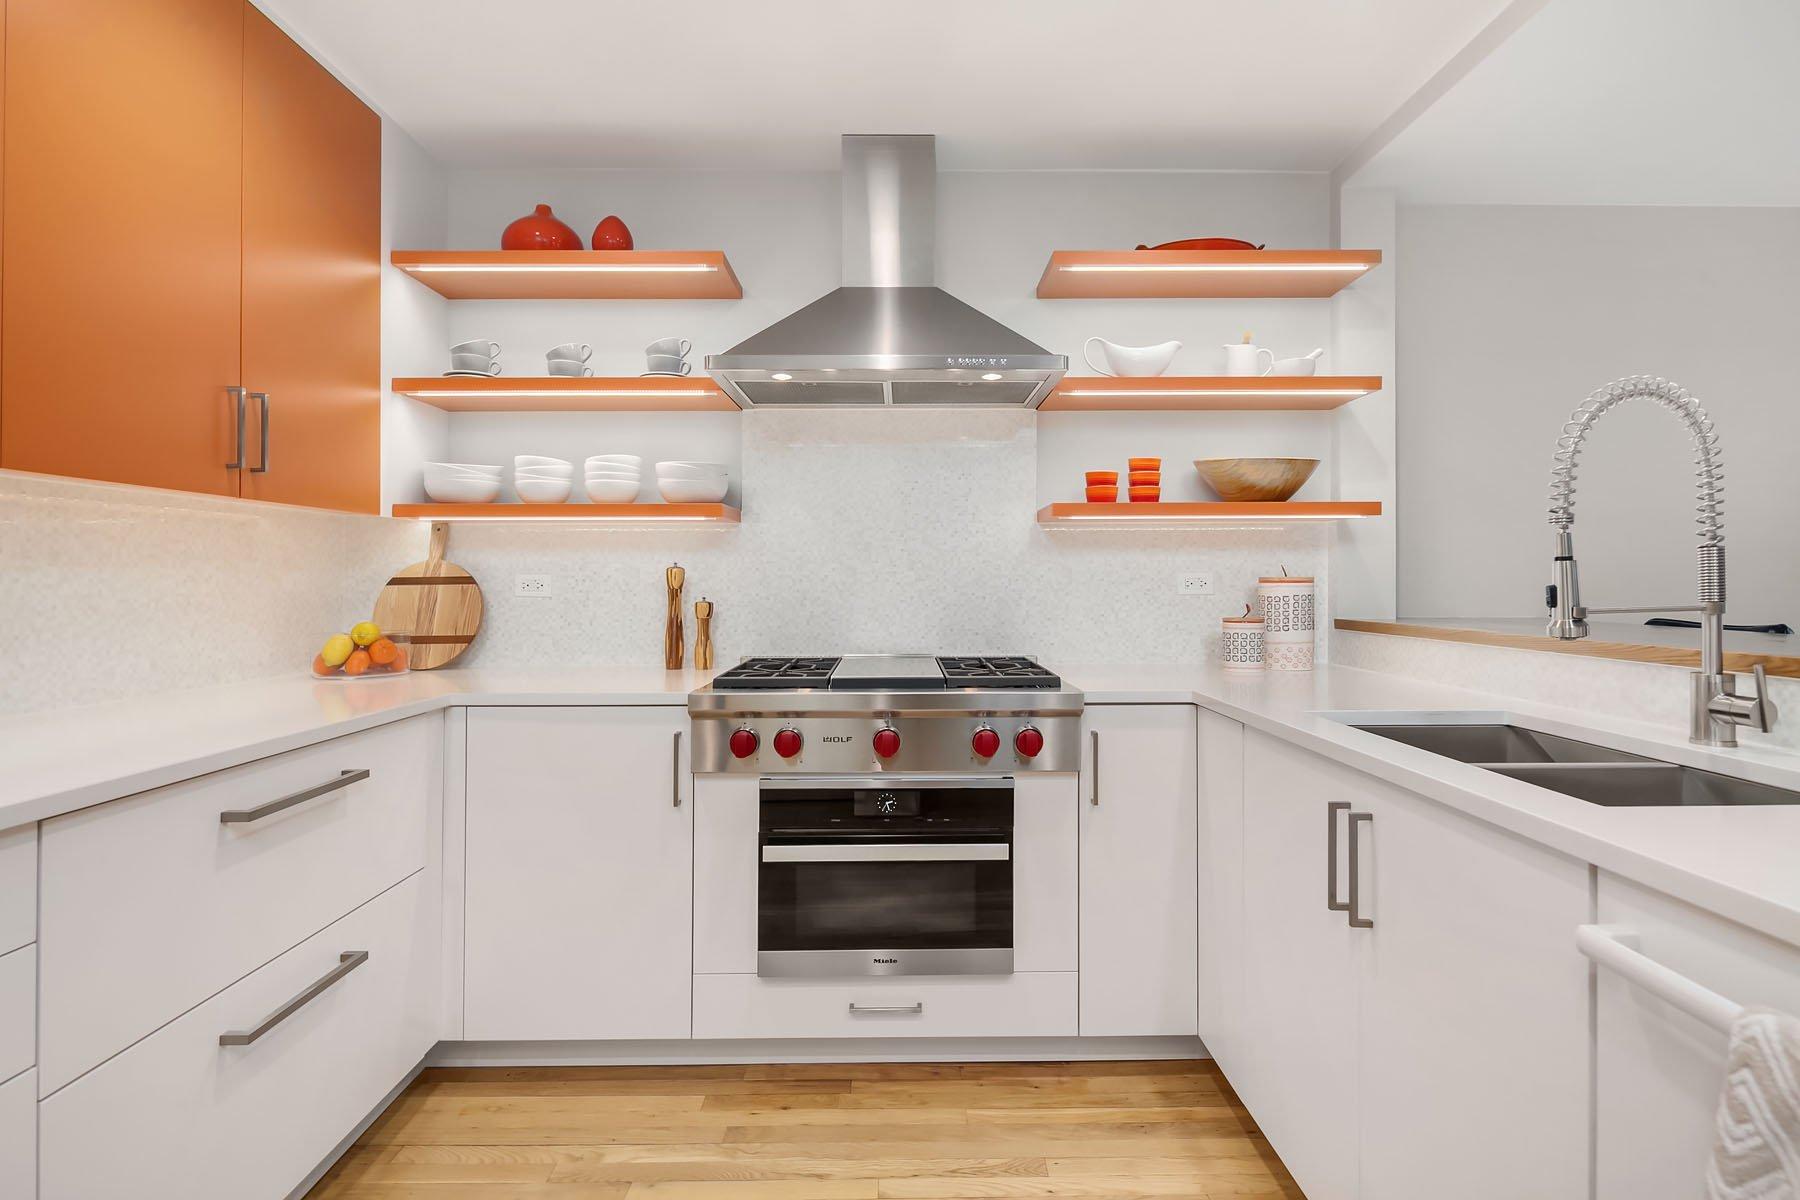 kitchen design chicago, kitchens chicago, hannah tindall, interior design, horseshoe kitchen, horseshoe layout